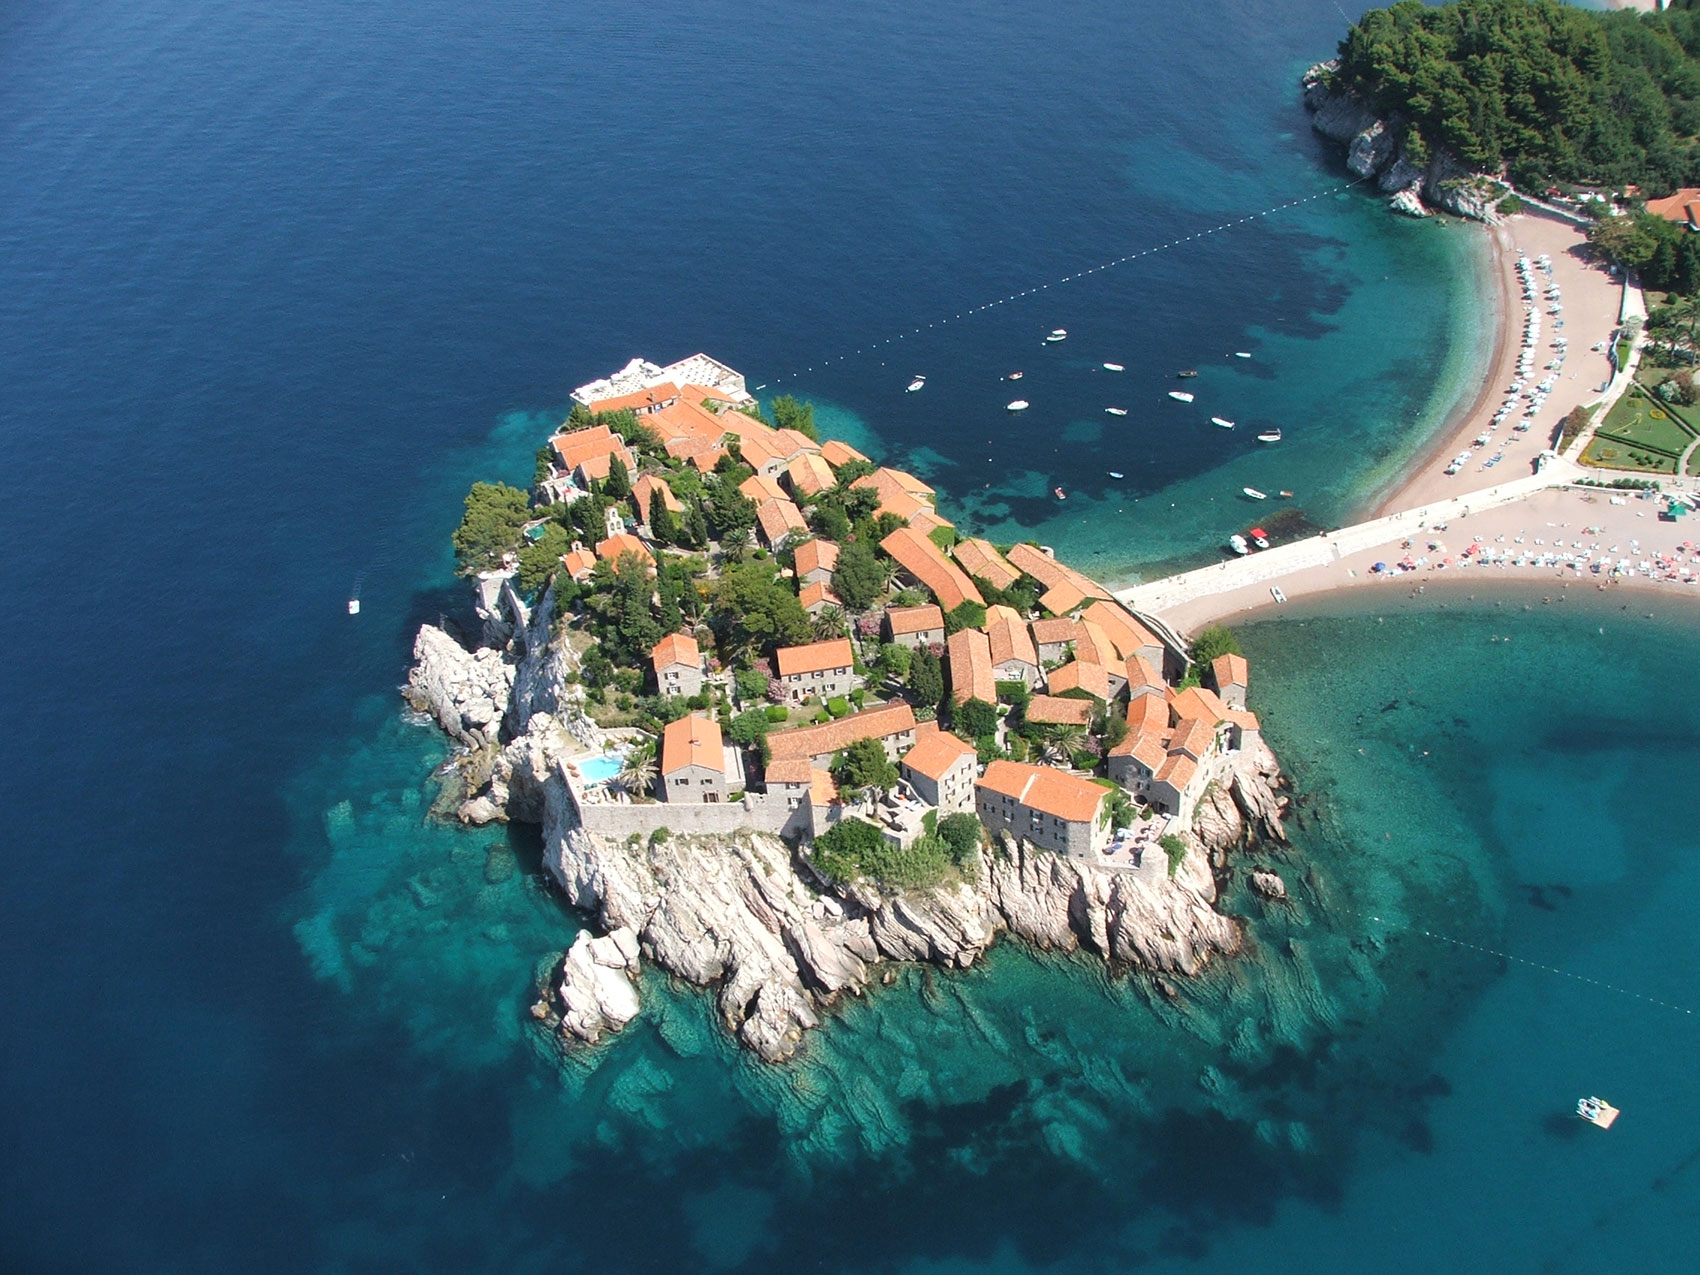 Island-of-Sveti-Stefan.jpg